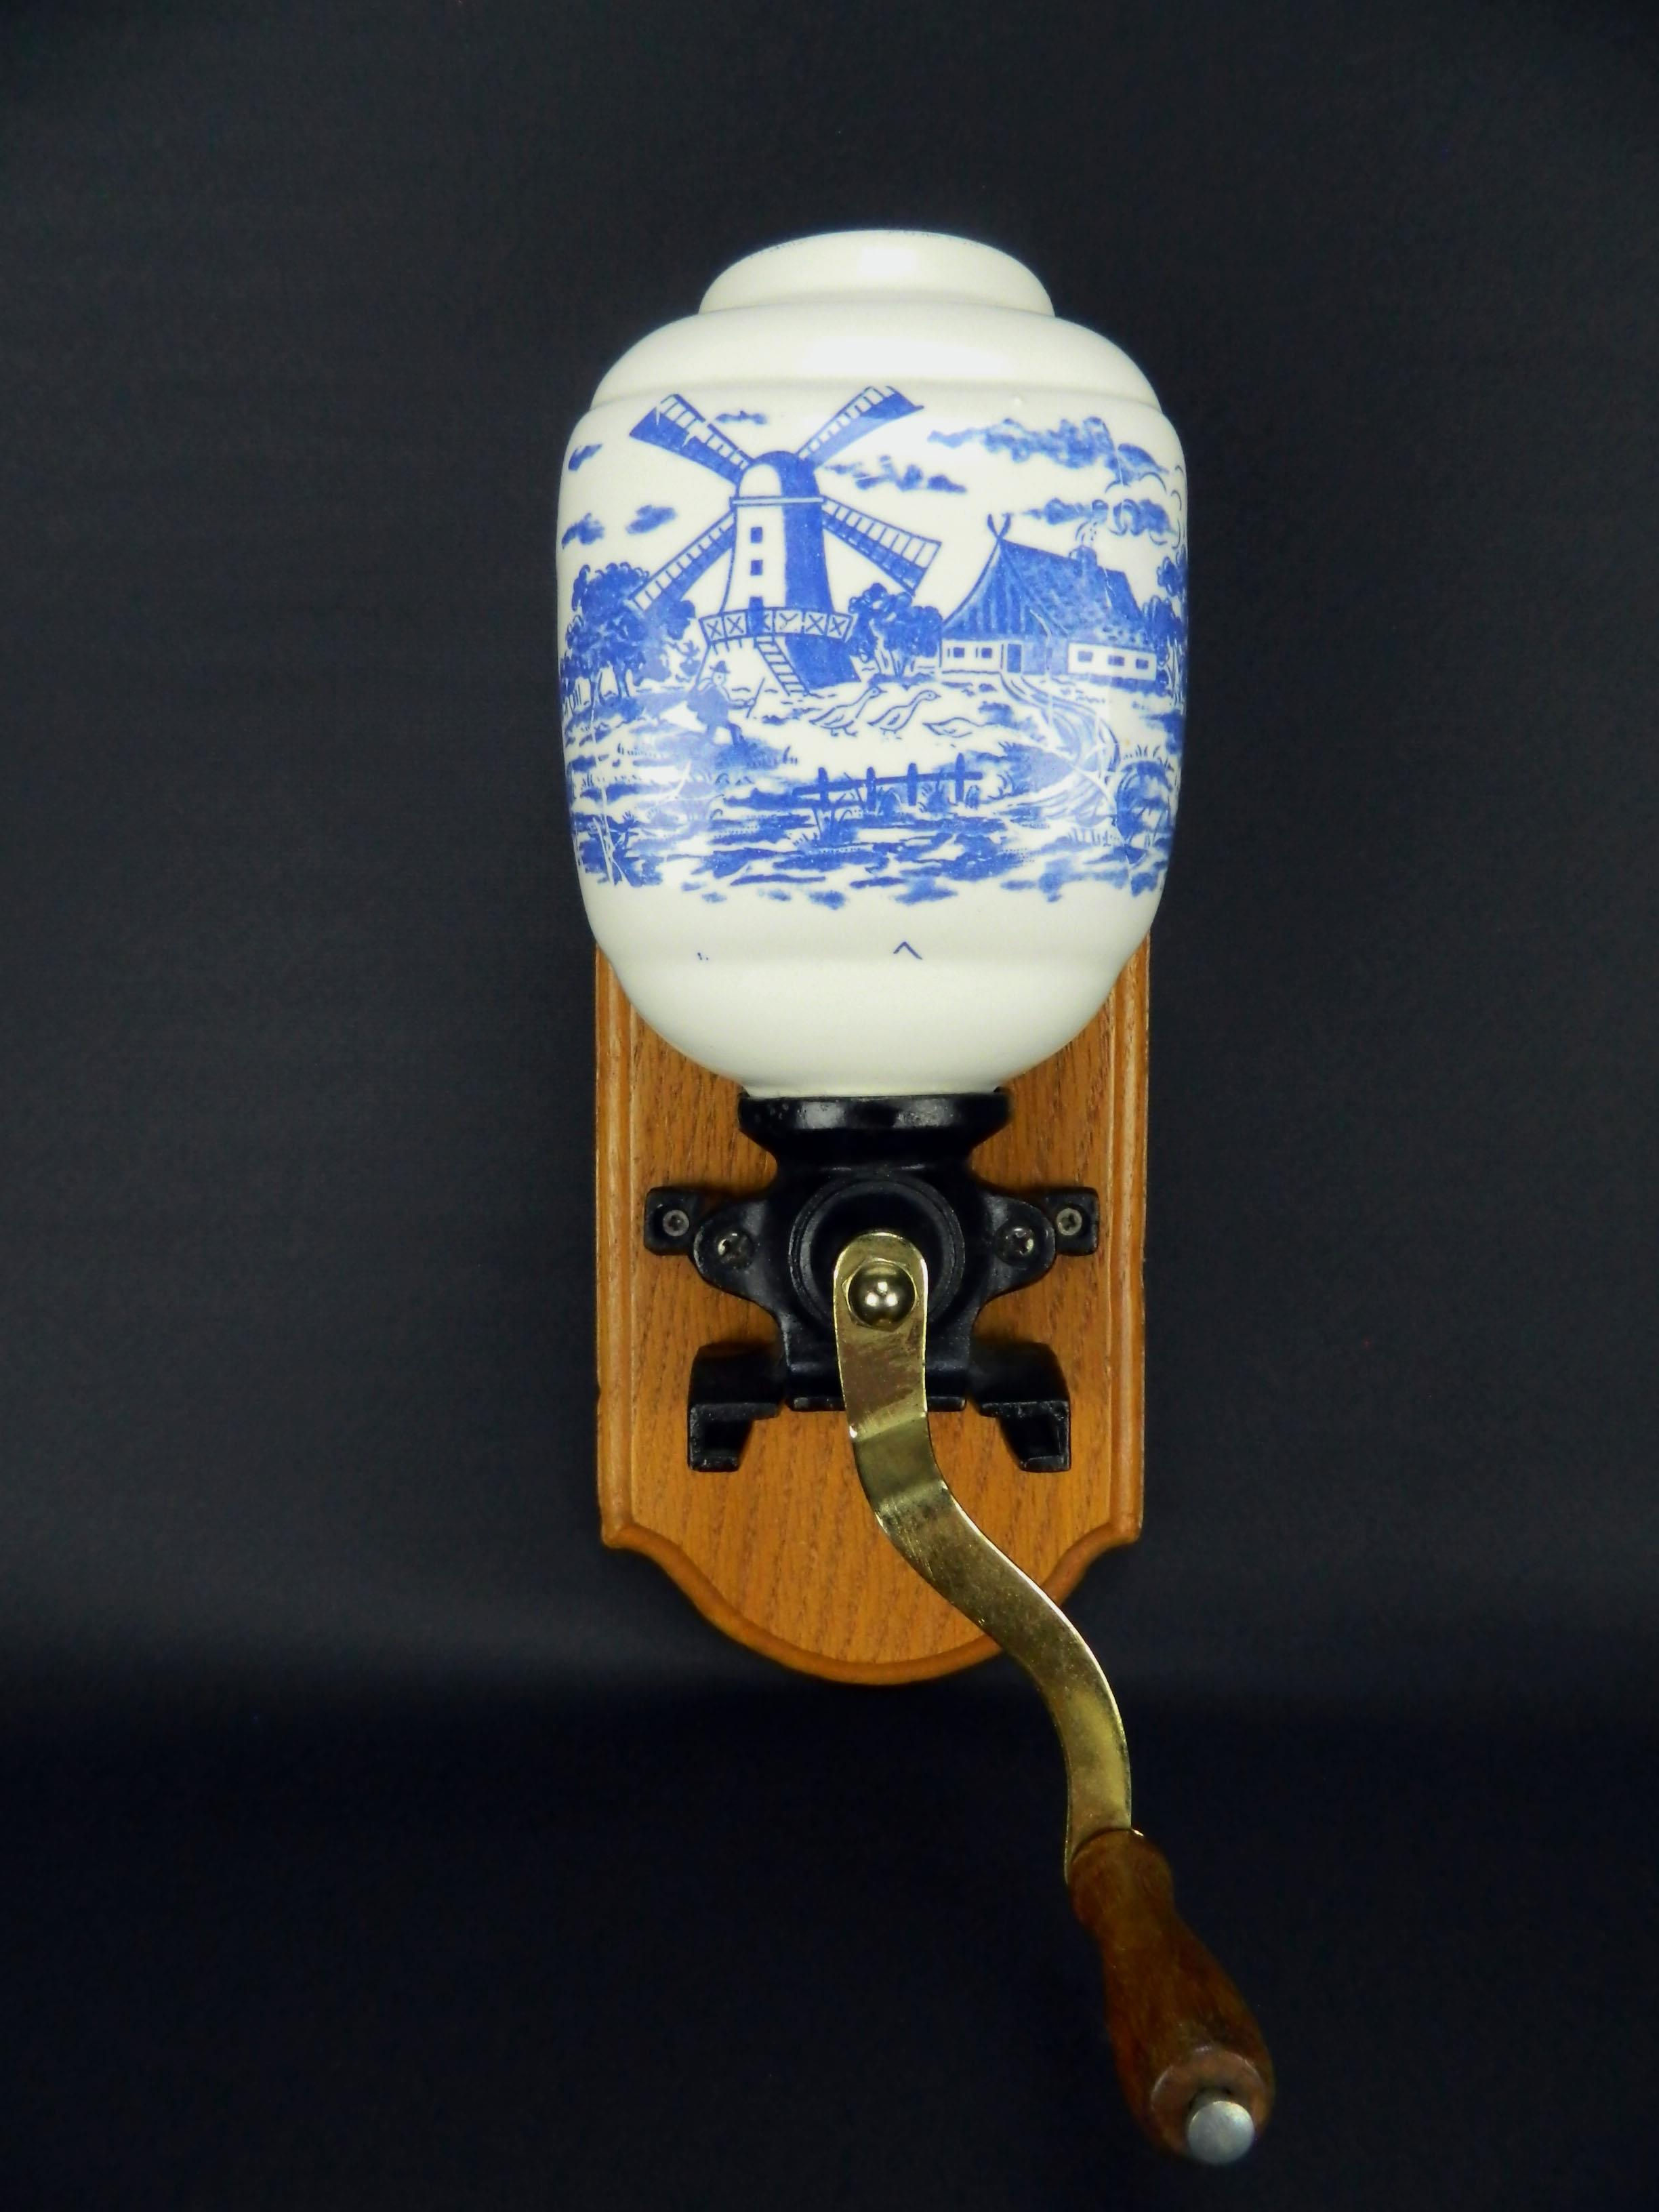 Vintage Delft Windmill Dutch Blue Amp White Porcelain Wall